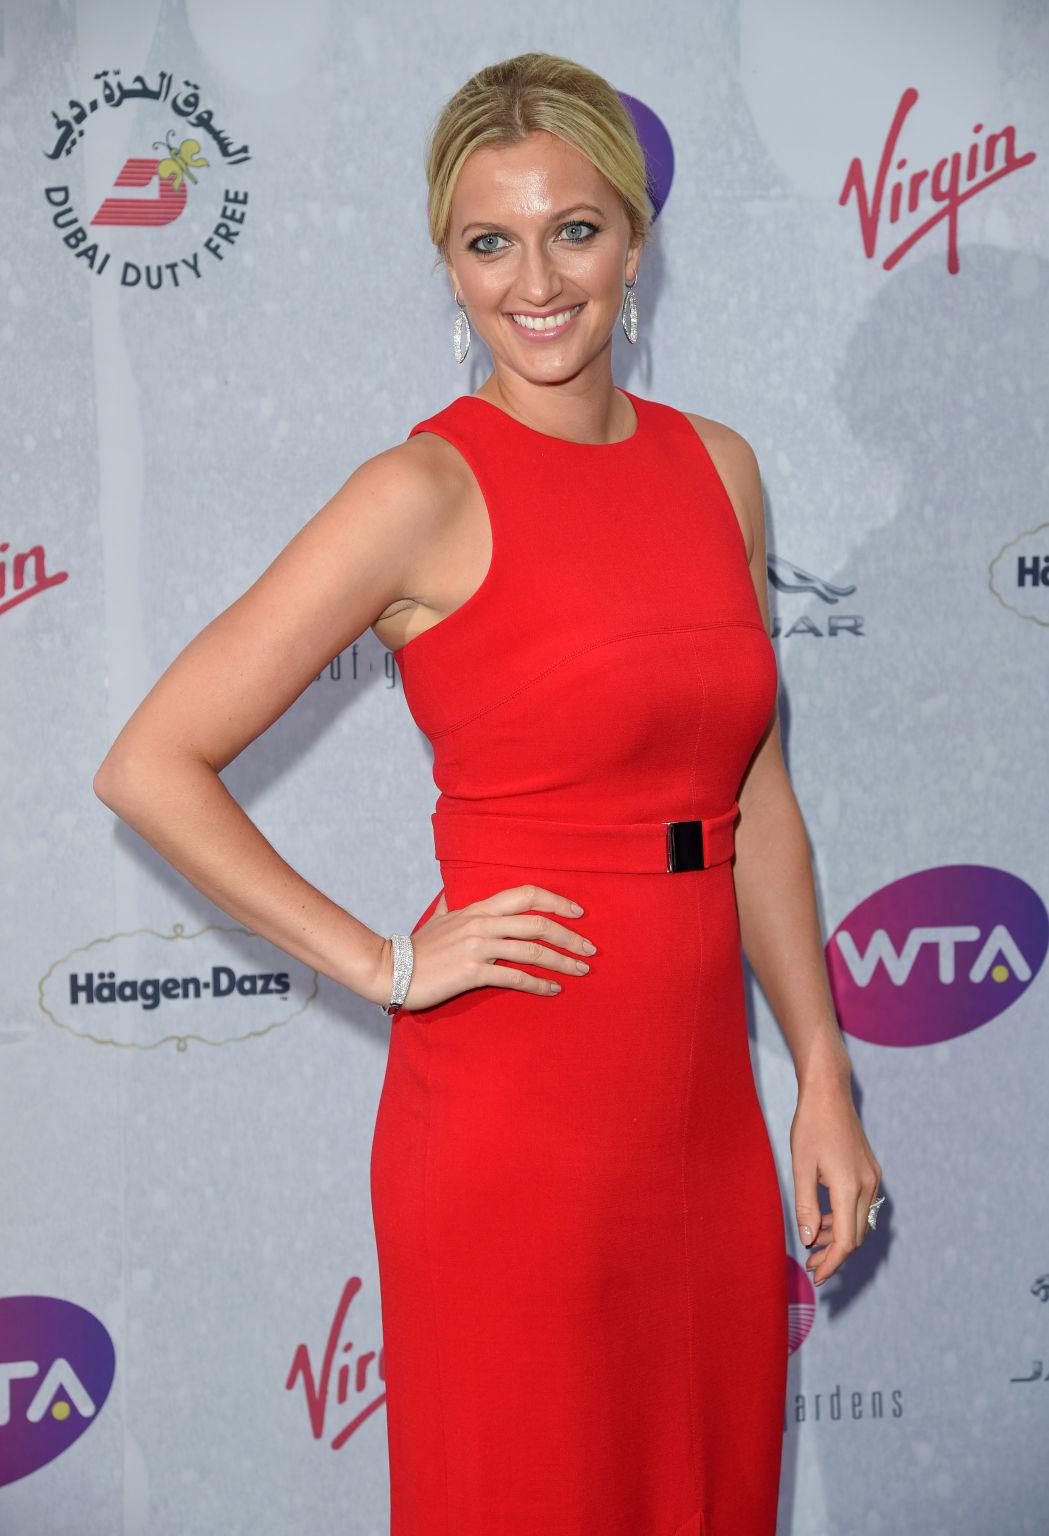 Die zweifache Wimbledon-Siegerin Petra Kvitova